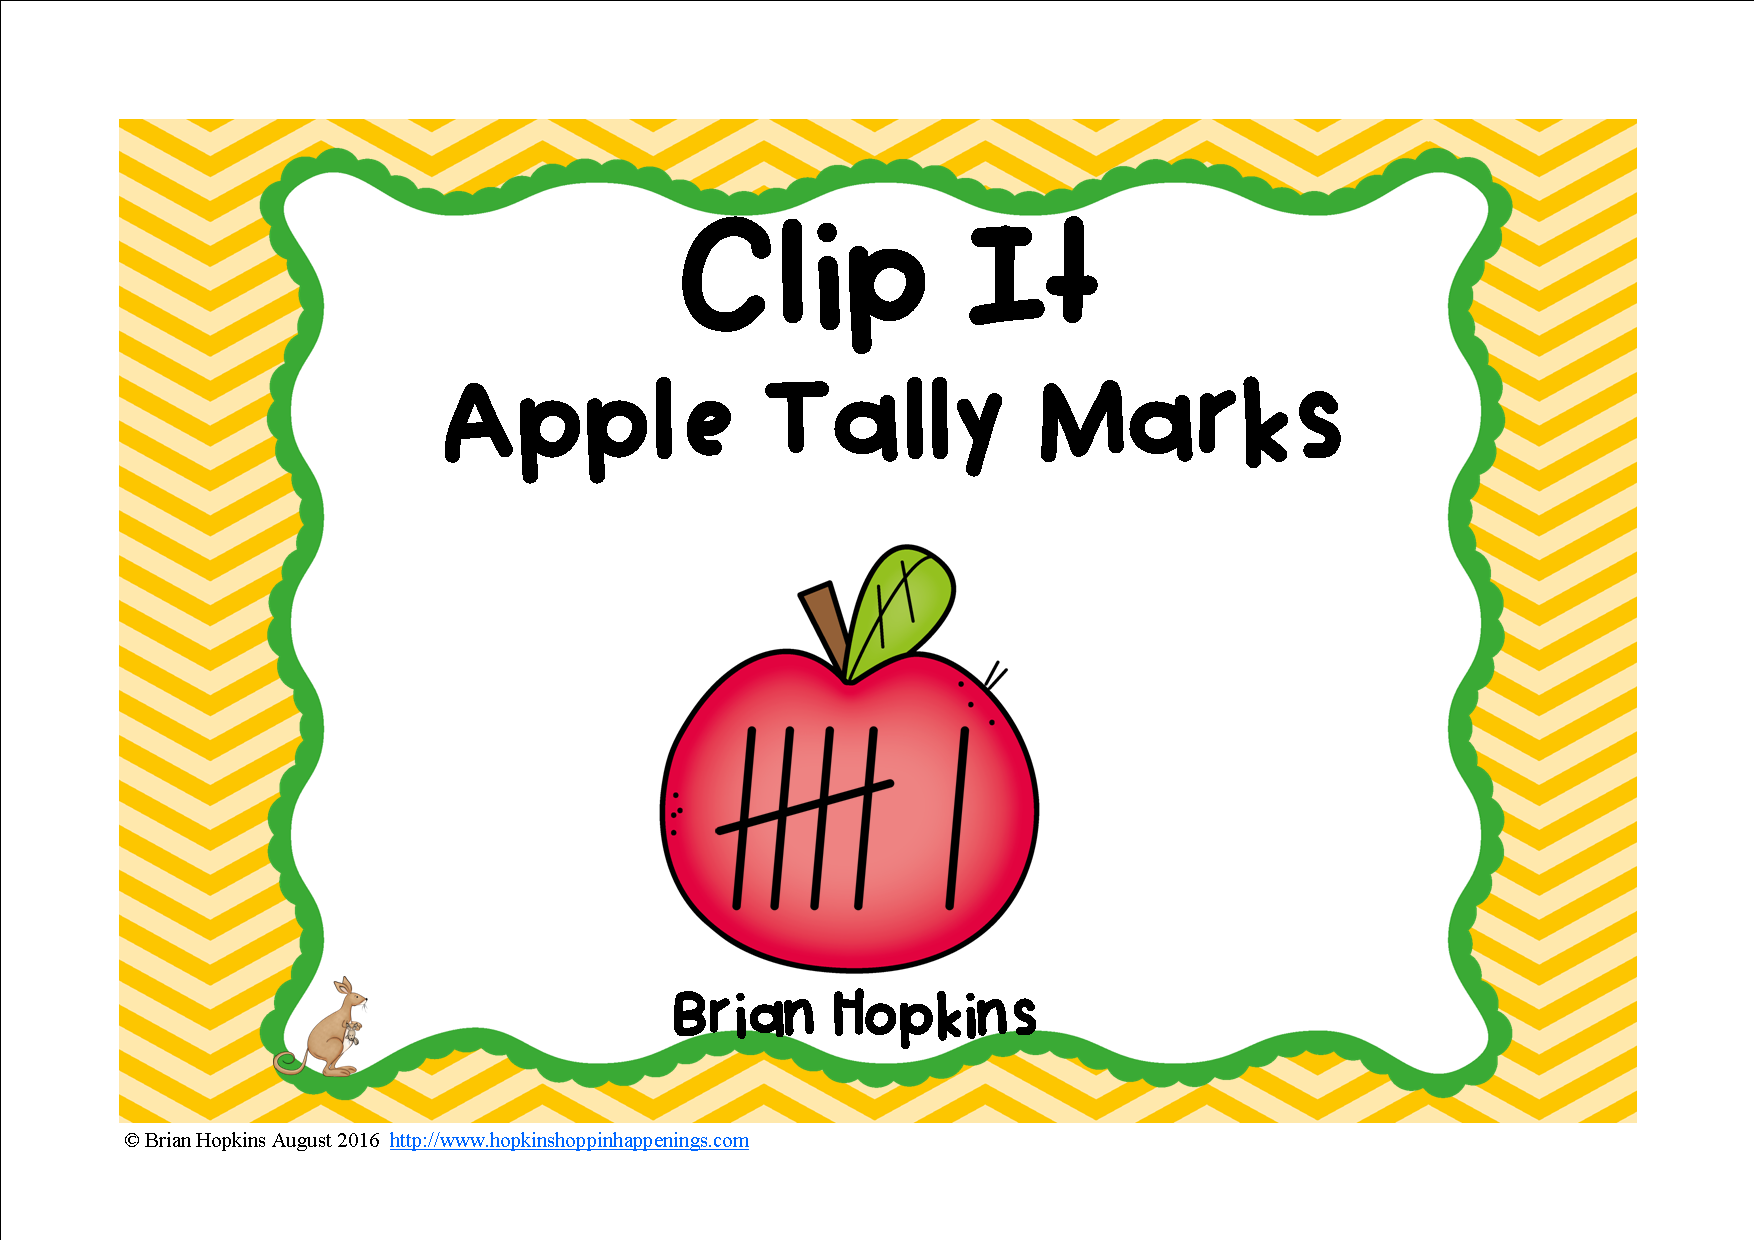 Clip It Apple Tally Marks